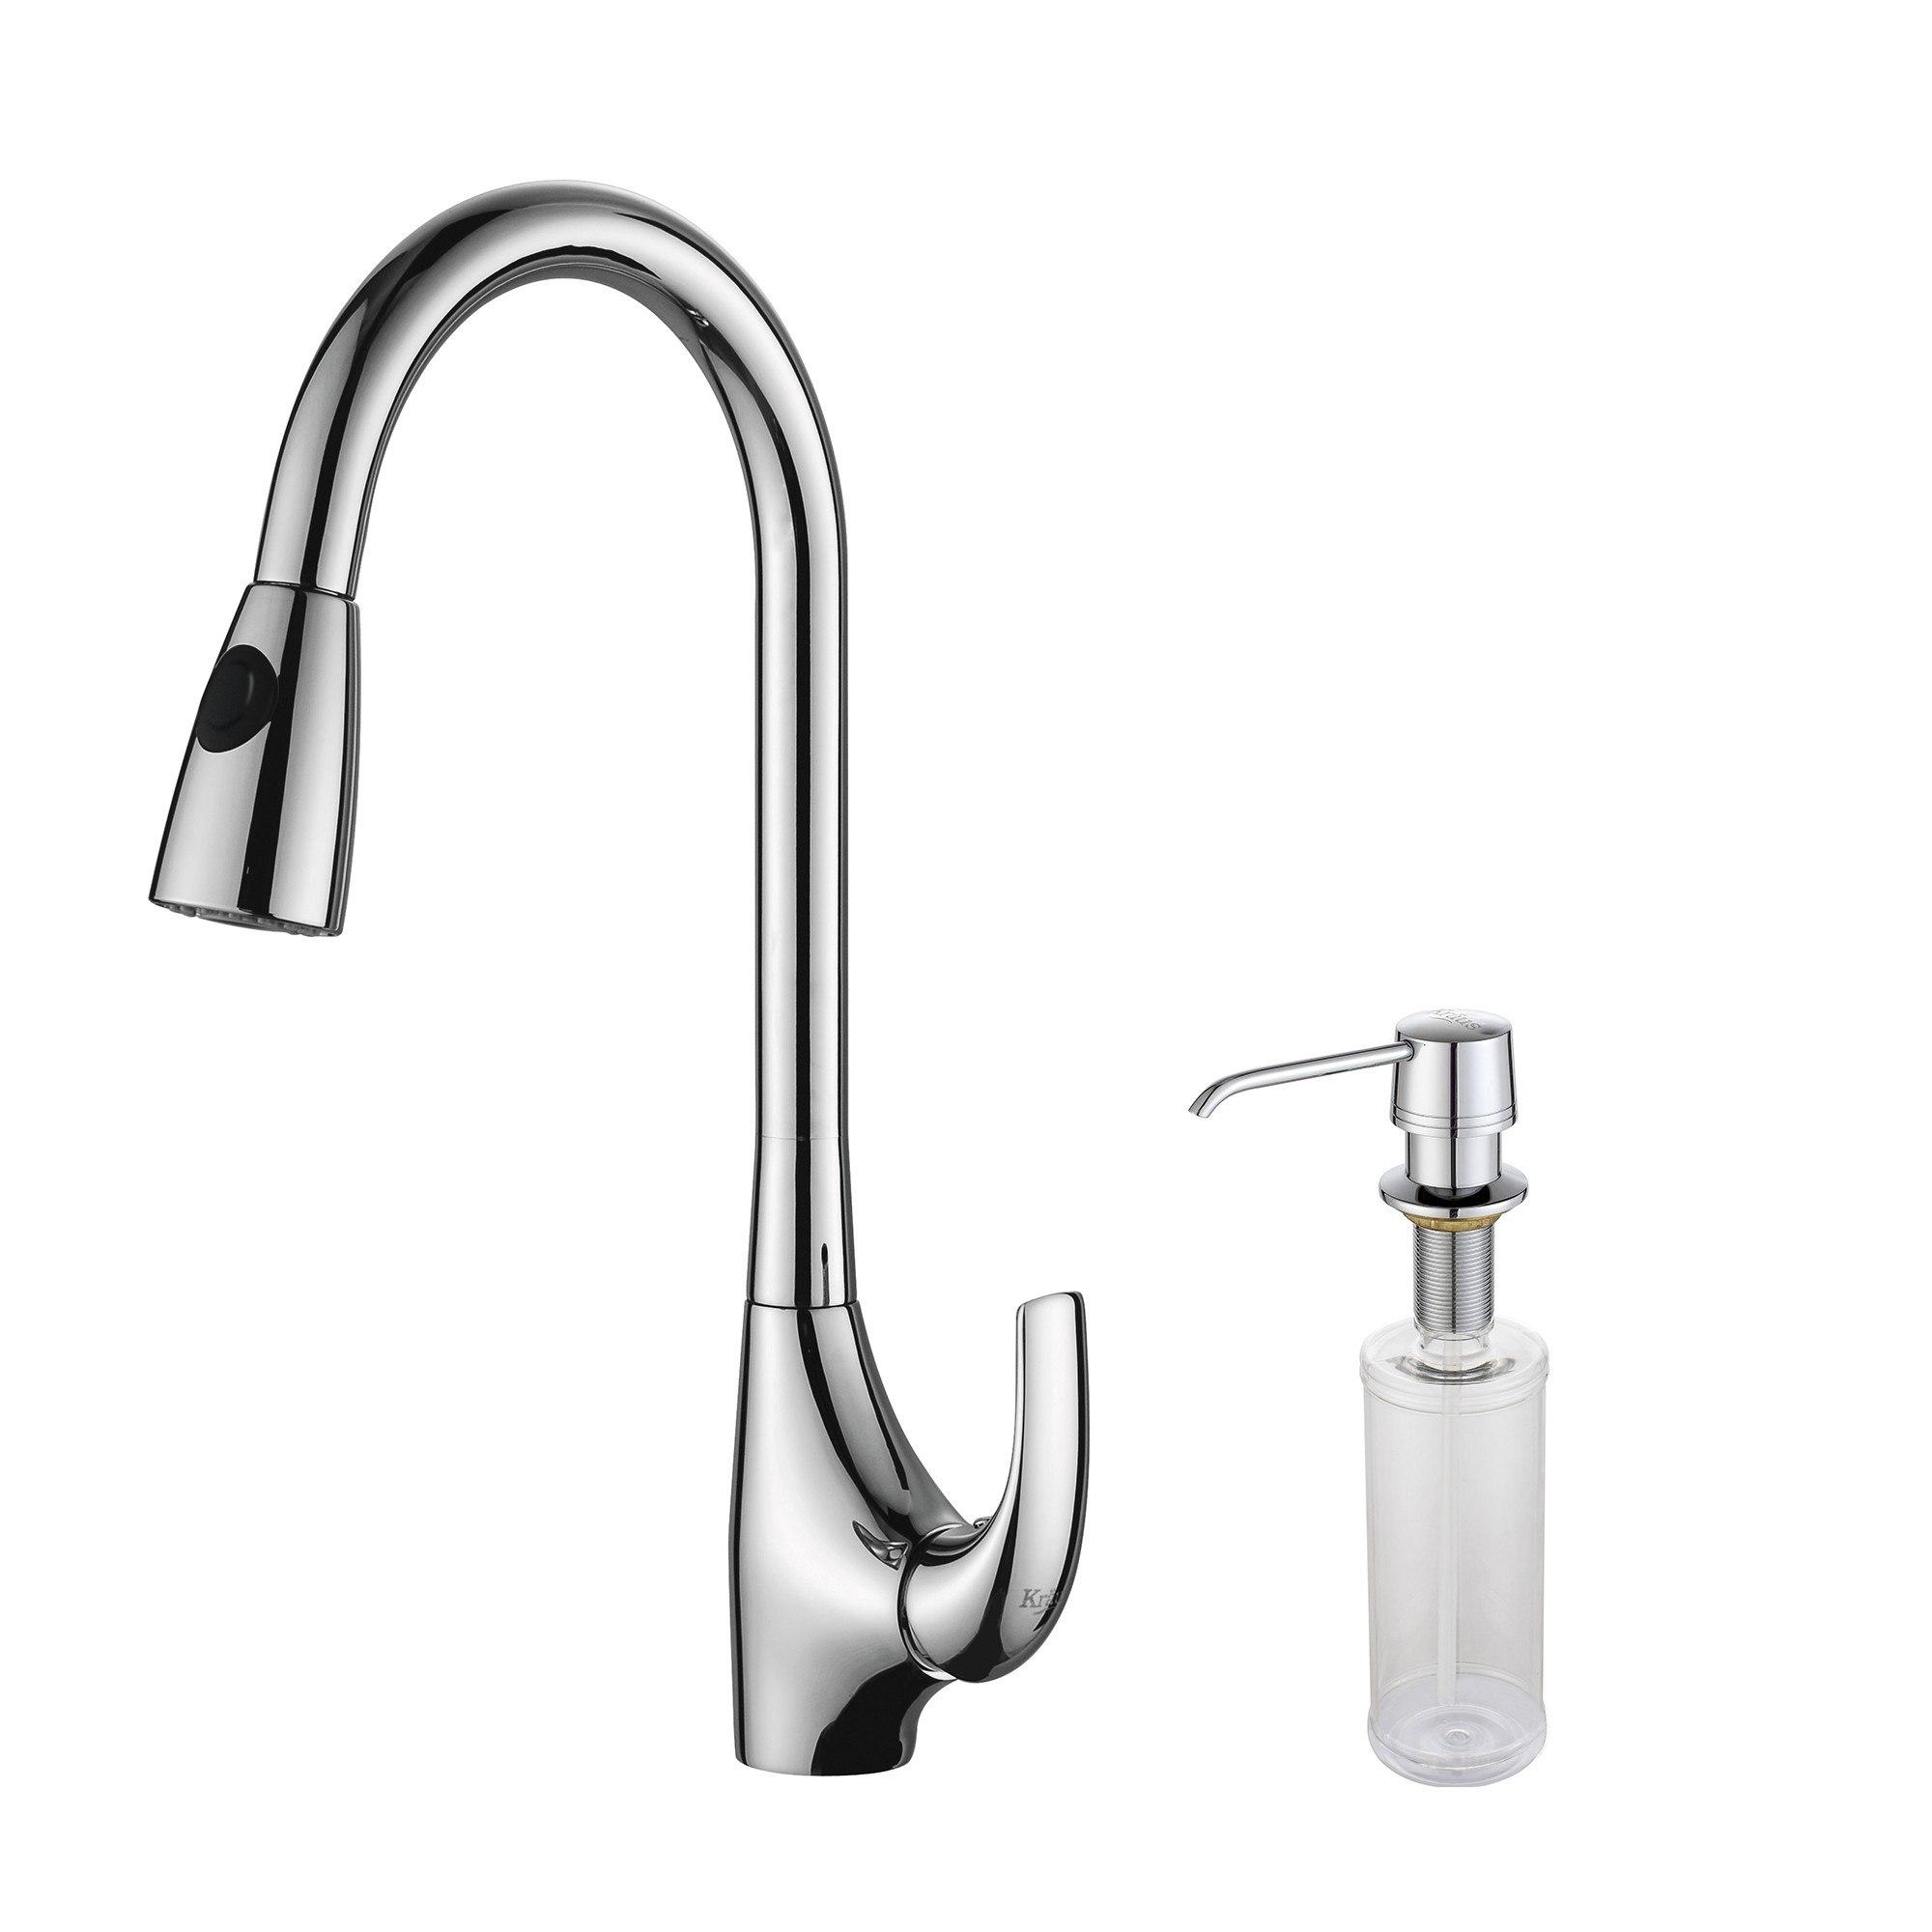 Kraus KPF-1621-KSD-30 Single Lever Pull-Out Kitchen Faucet & Soap Dispenser